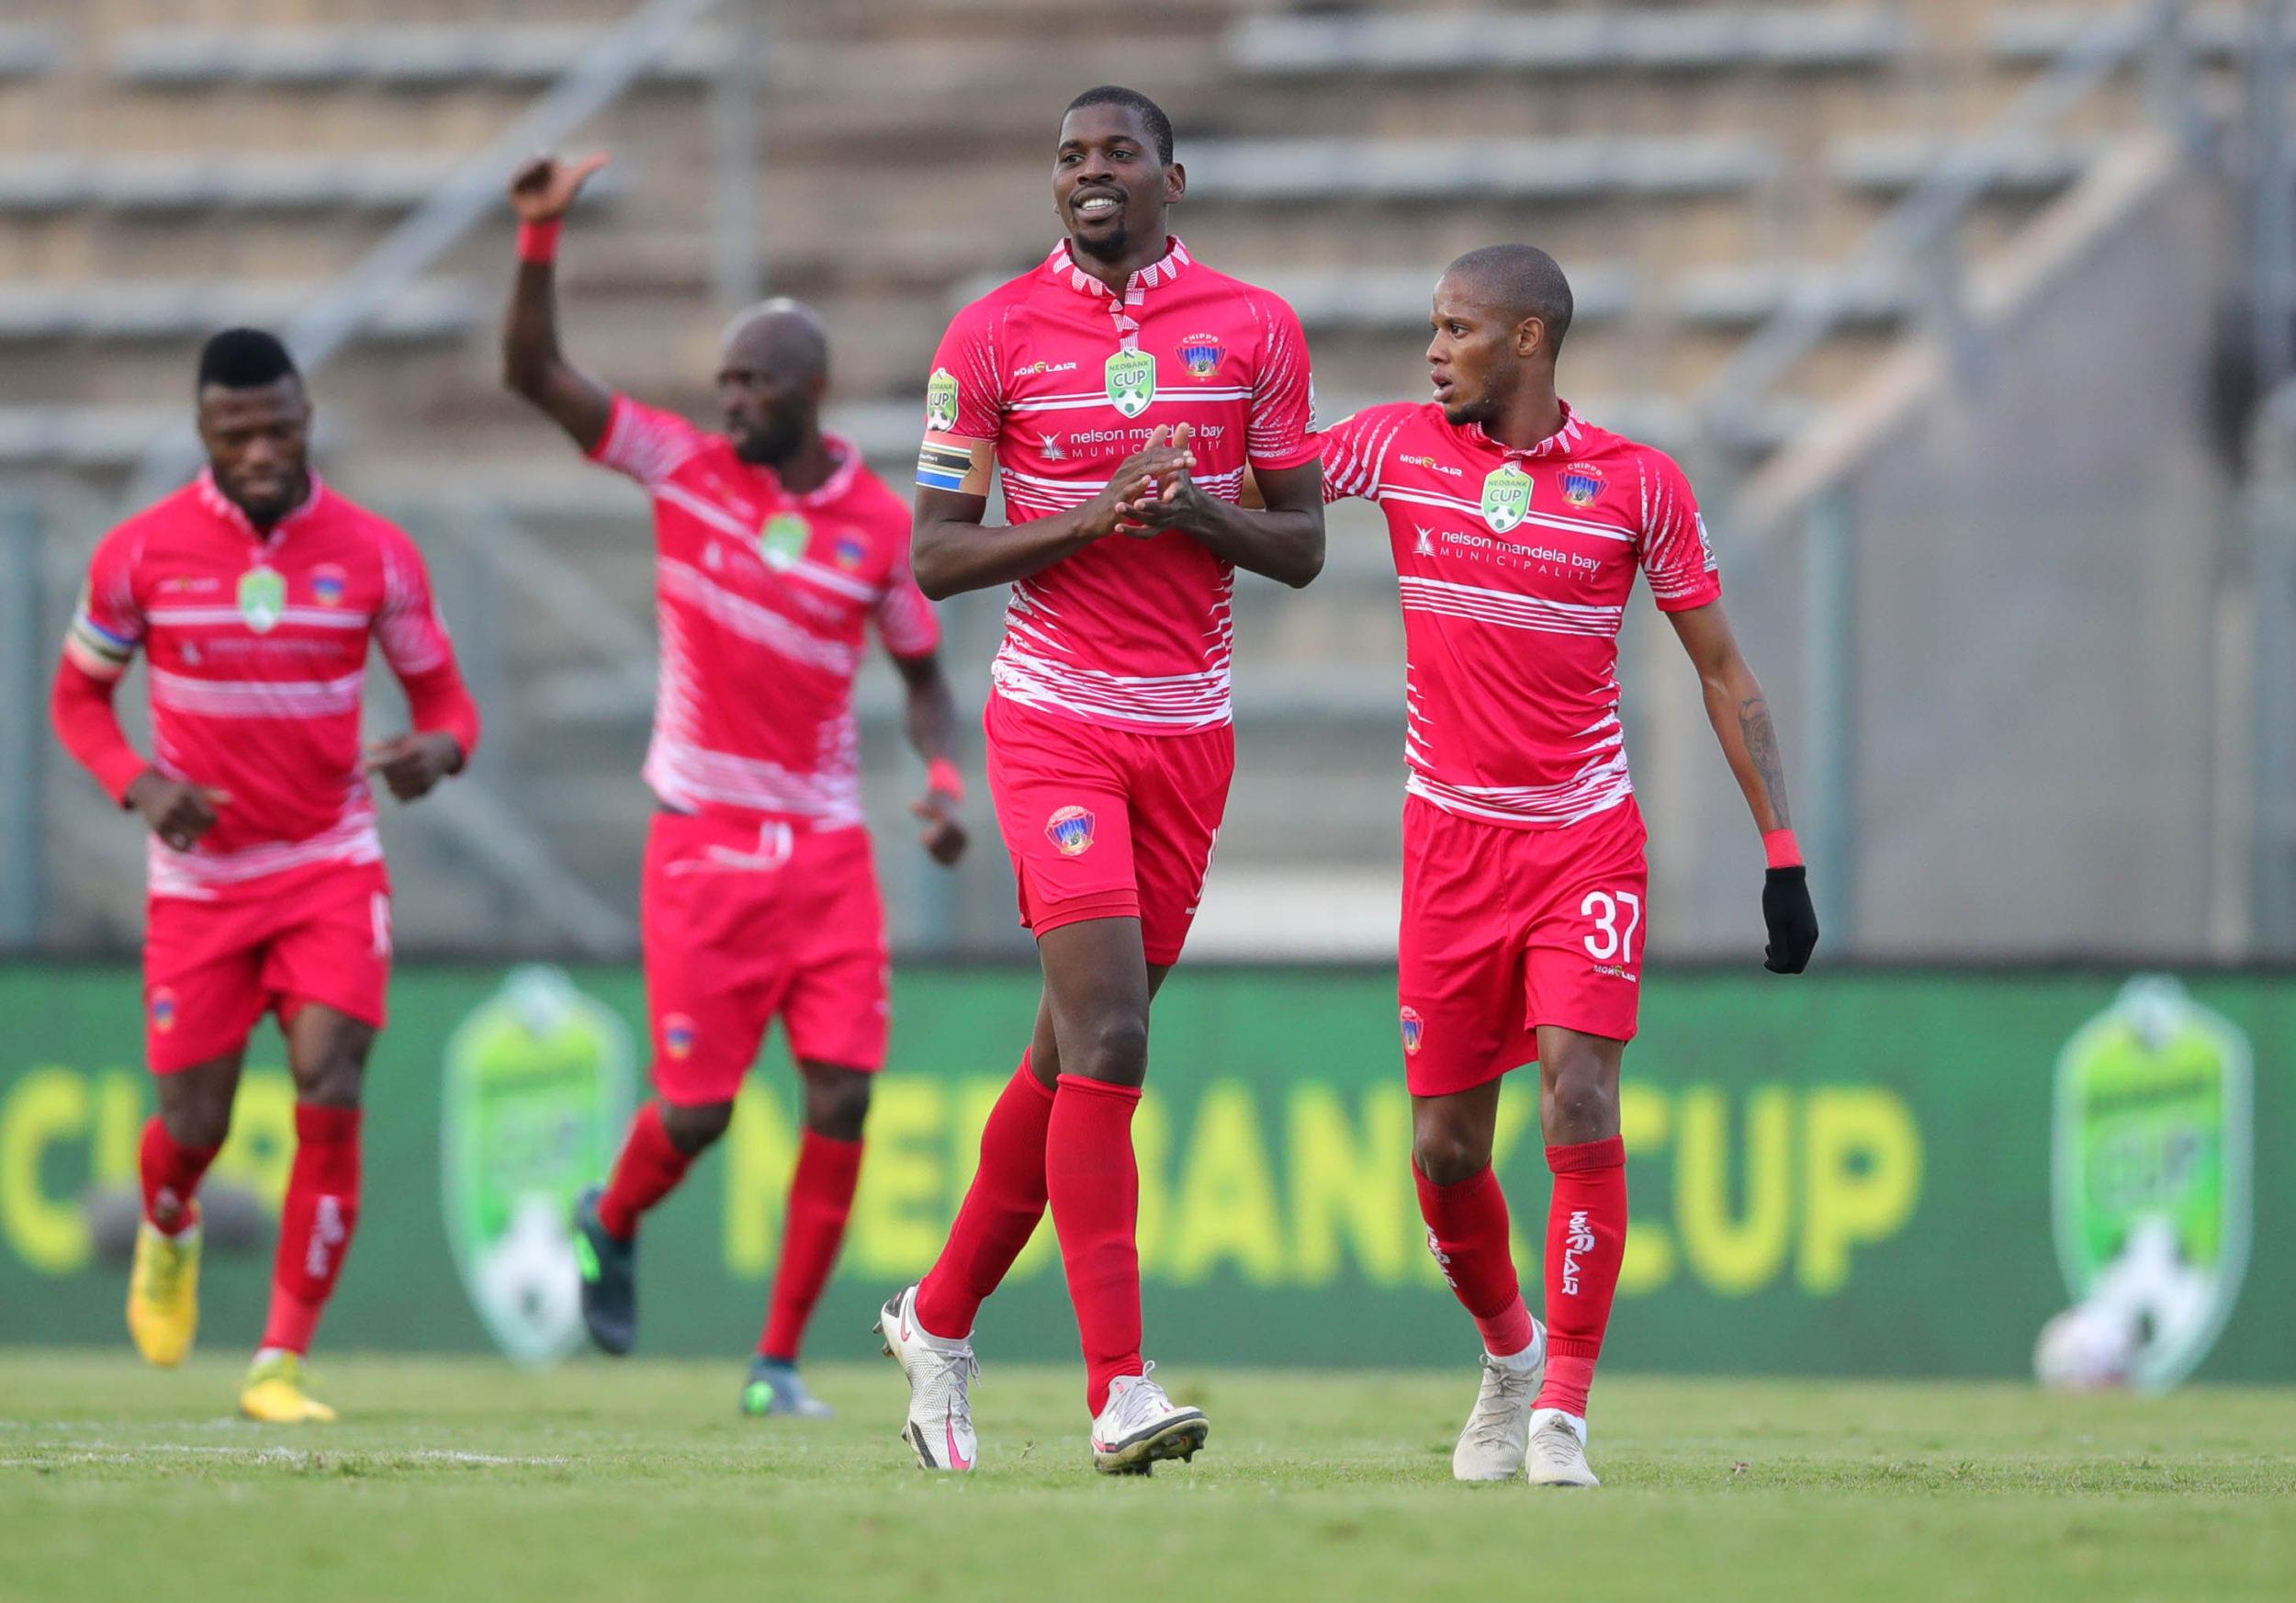 Football - 2021 Nedbank Cup - Semifinal - Pretoria Callies v Chippa United - Lucas Moripe Stadium